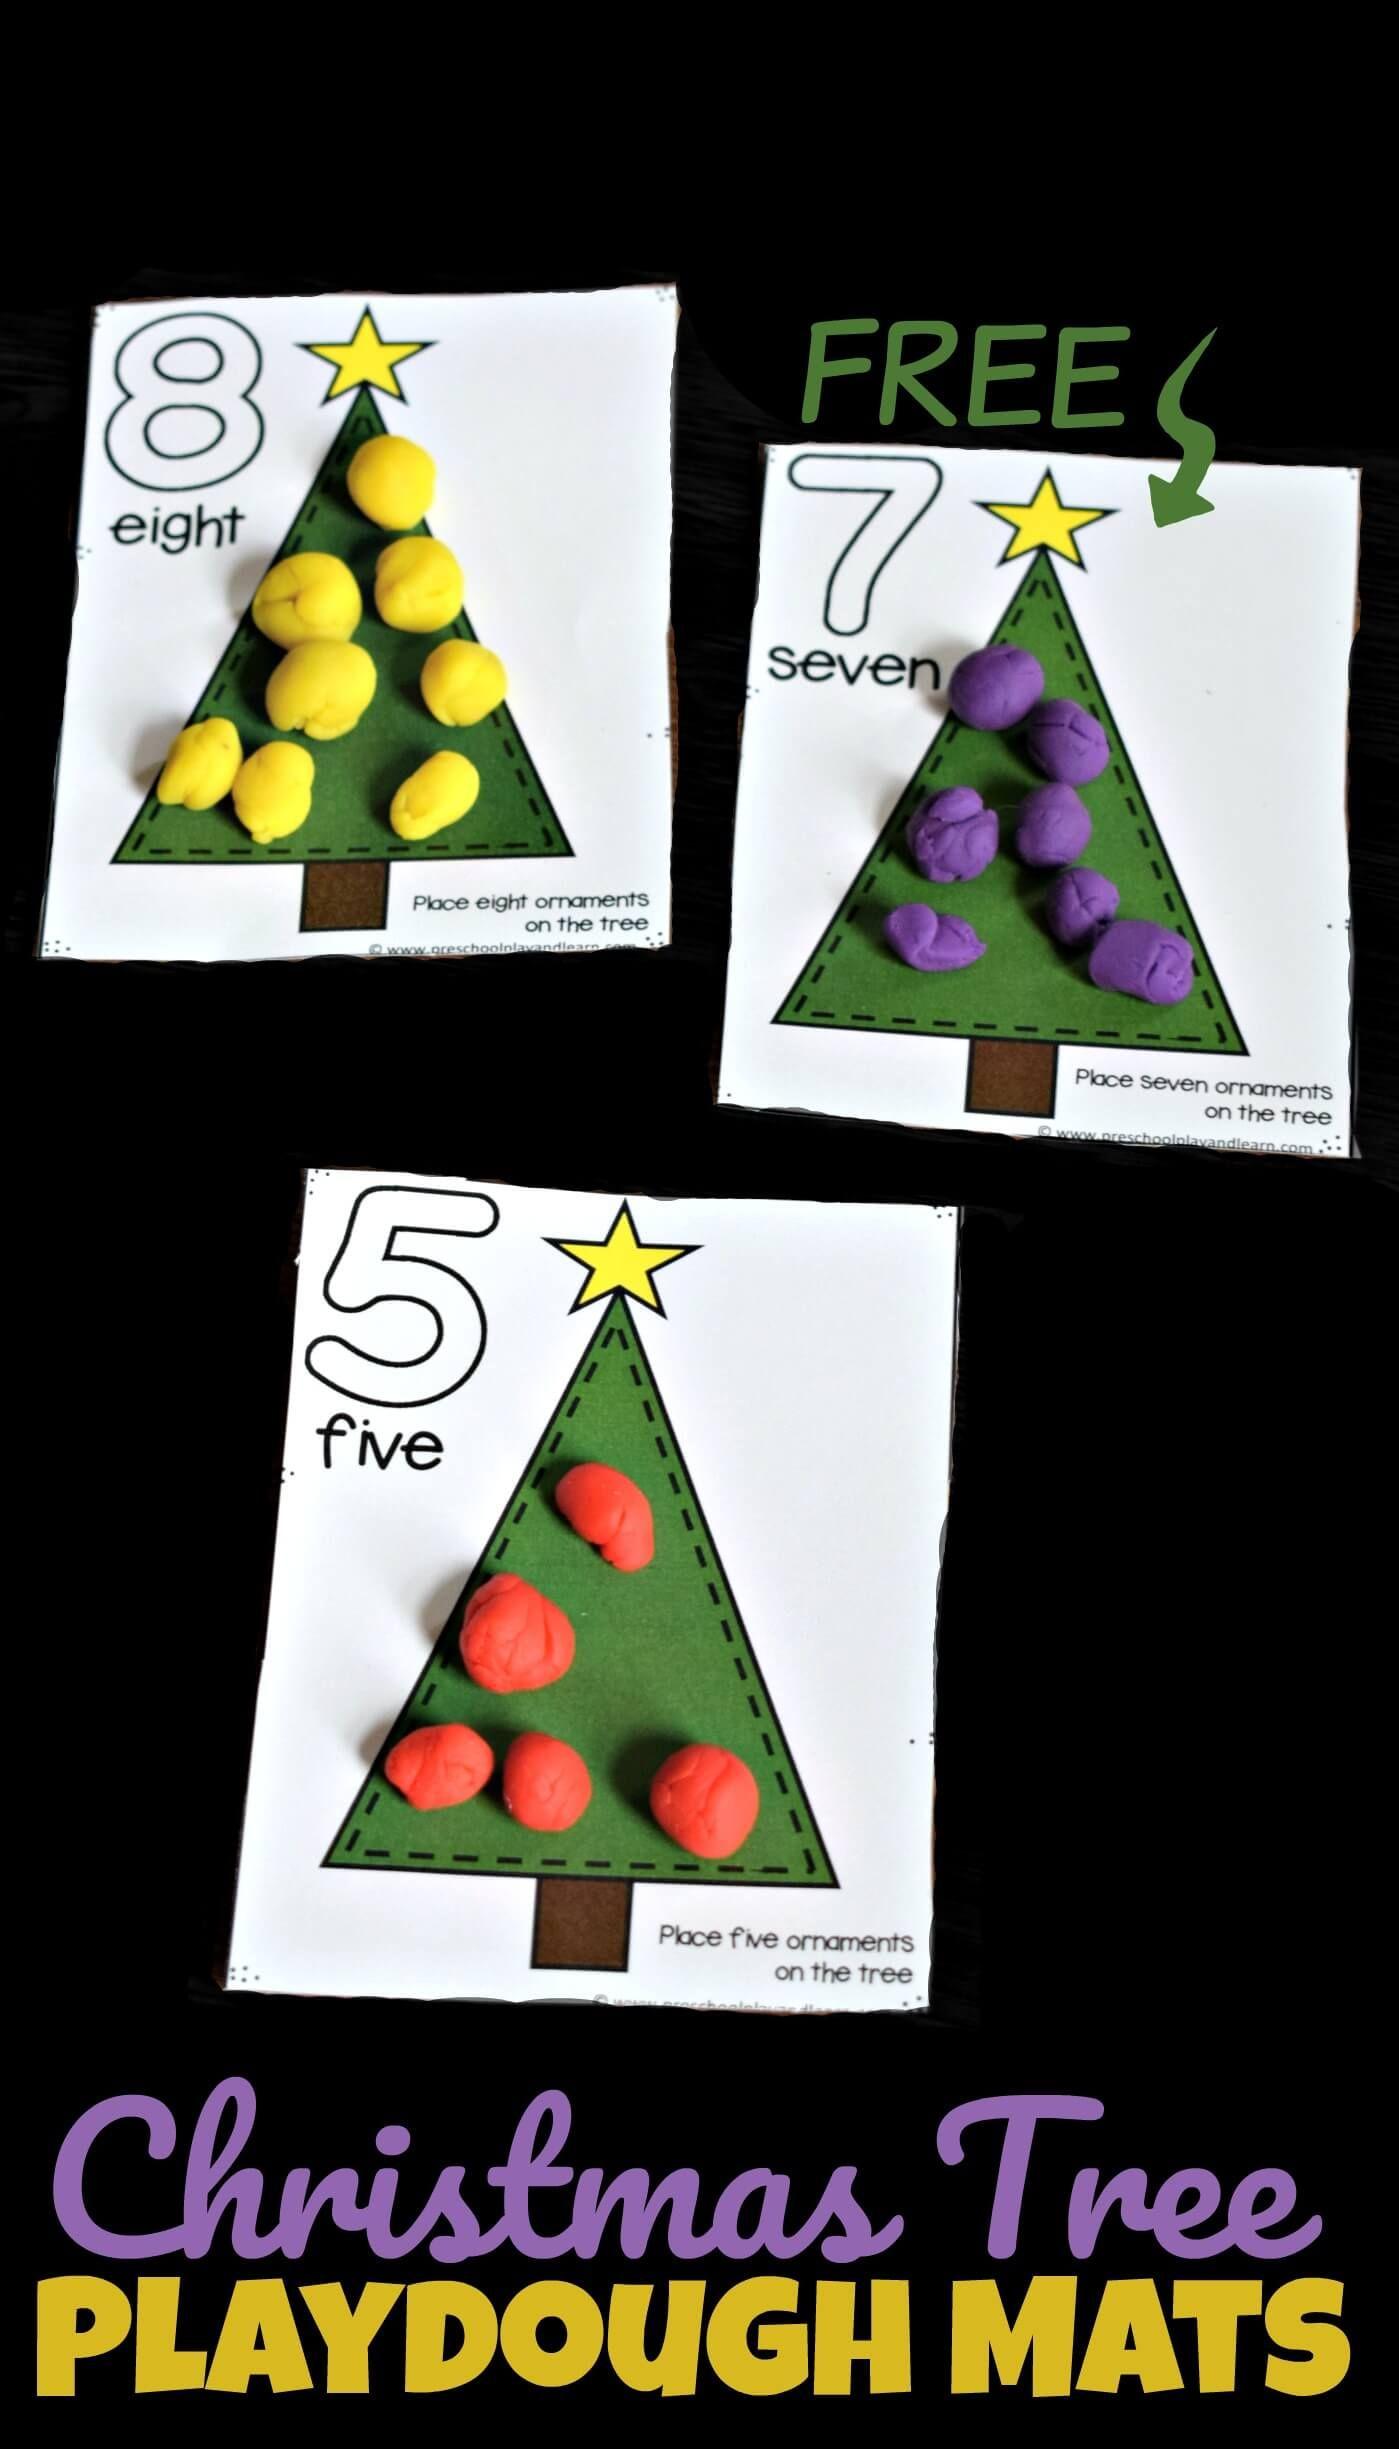 Free Christmas Tree Playdough Mats